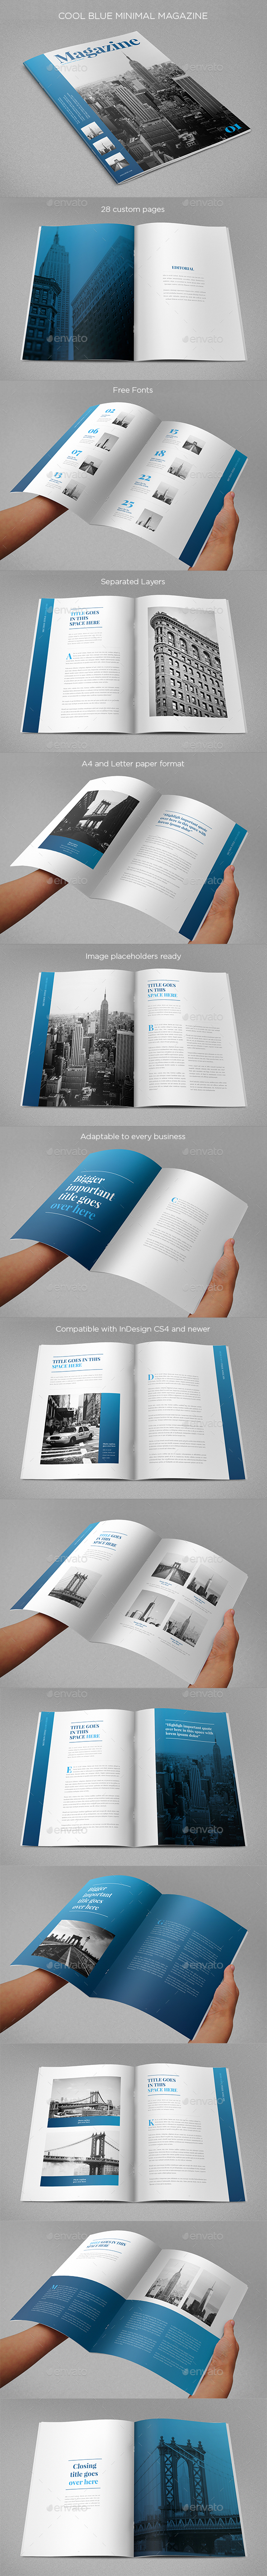 Cool Blue Minimal Magazine - Magazines Print Templates